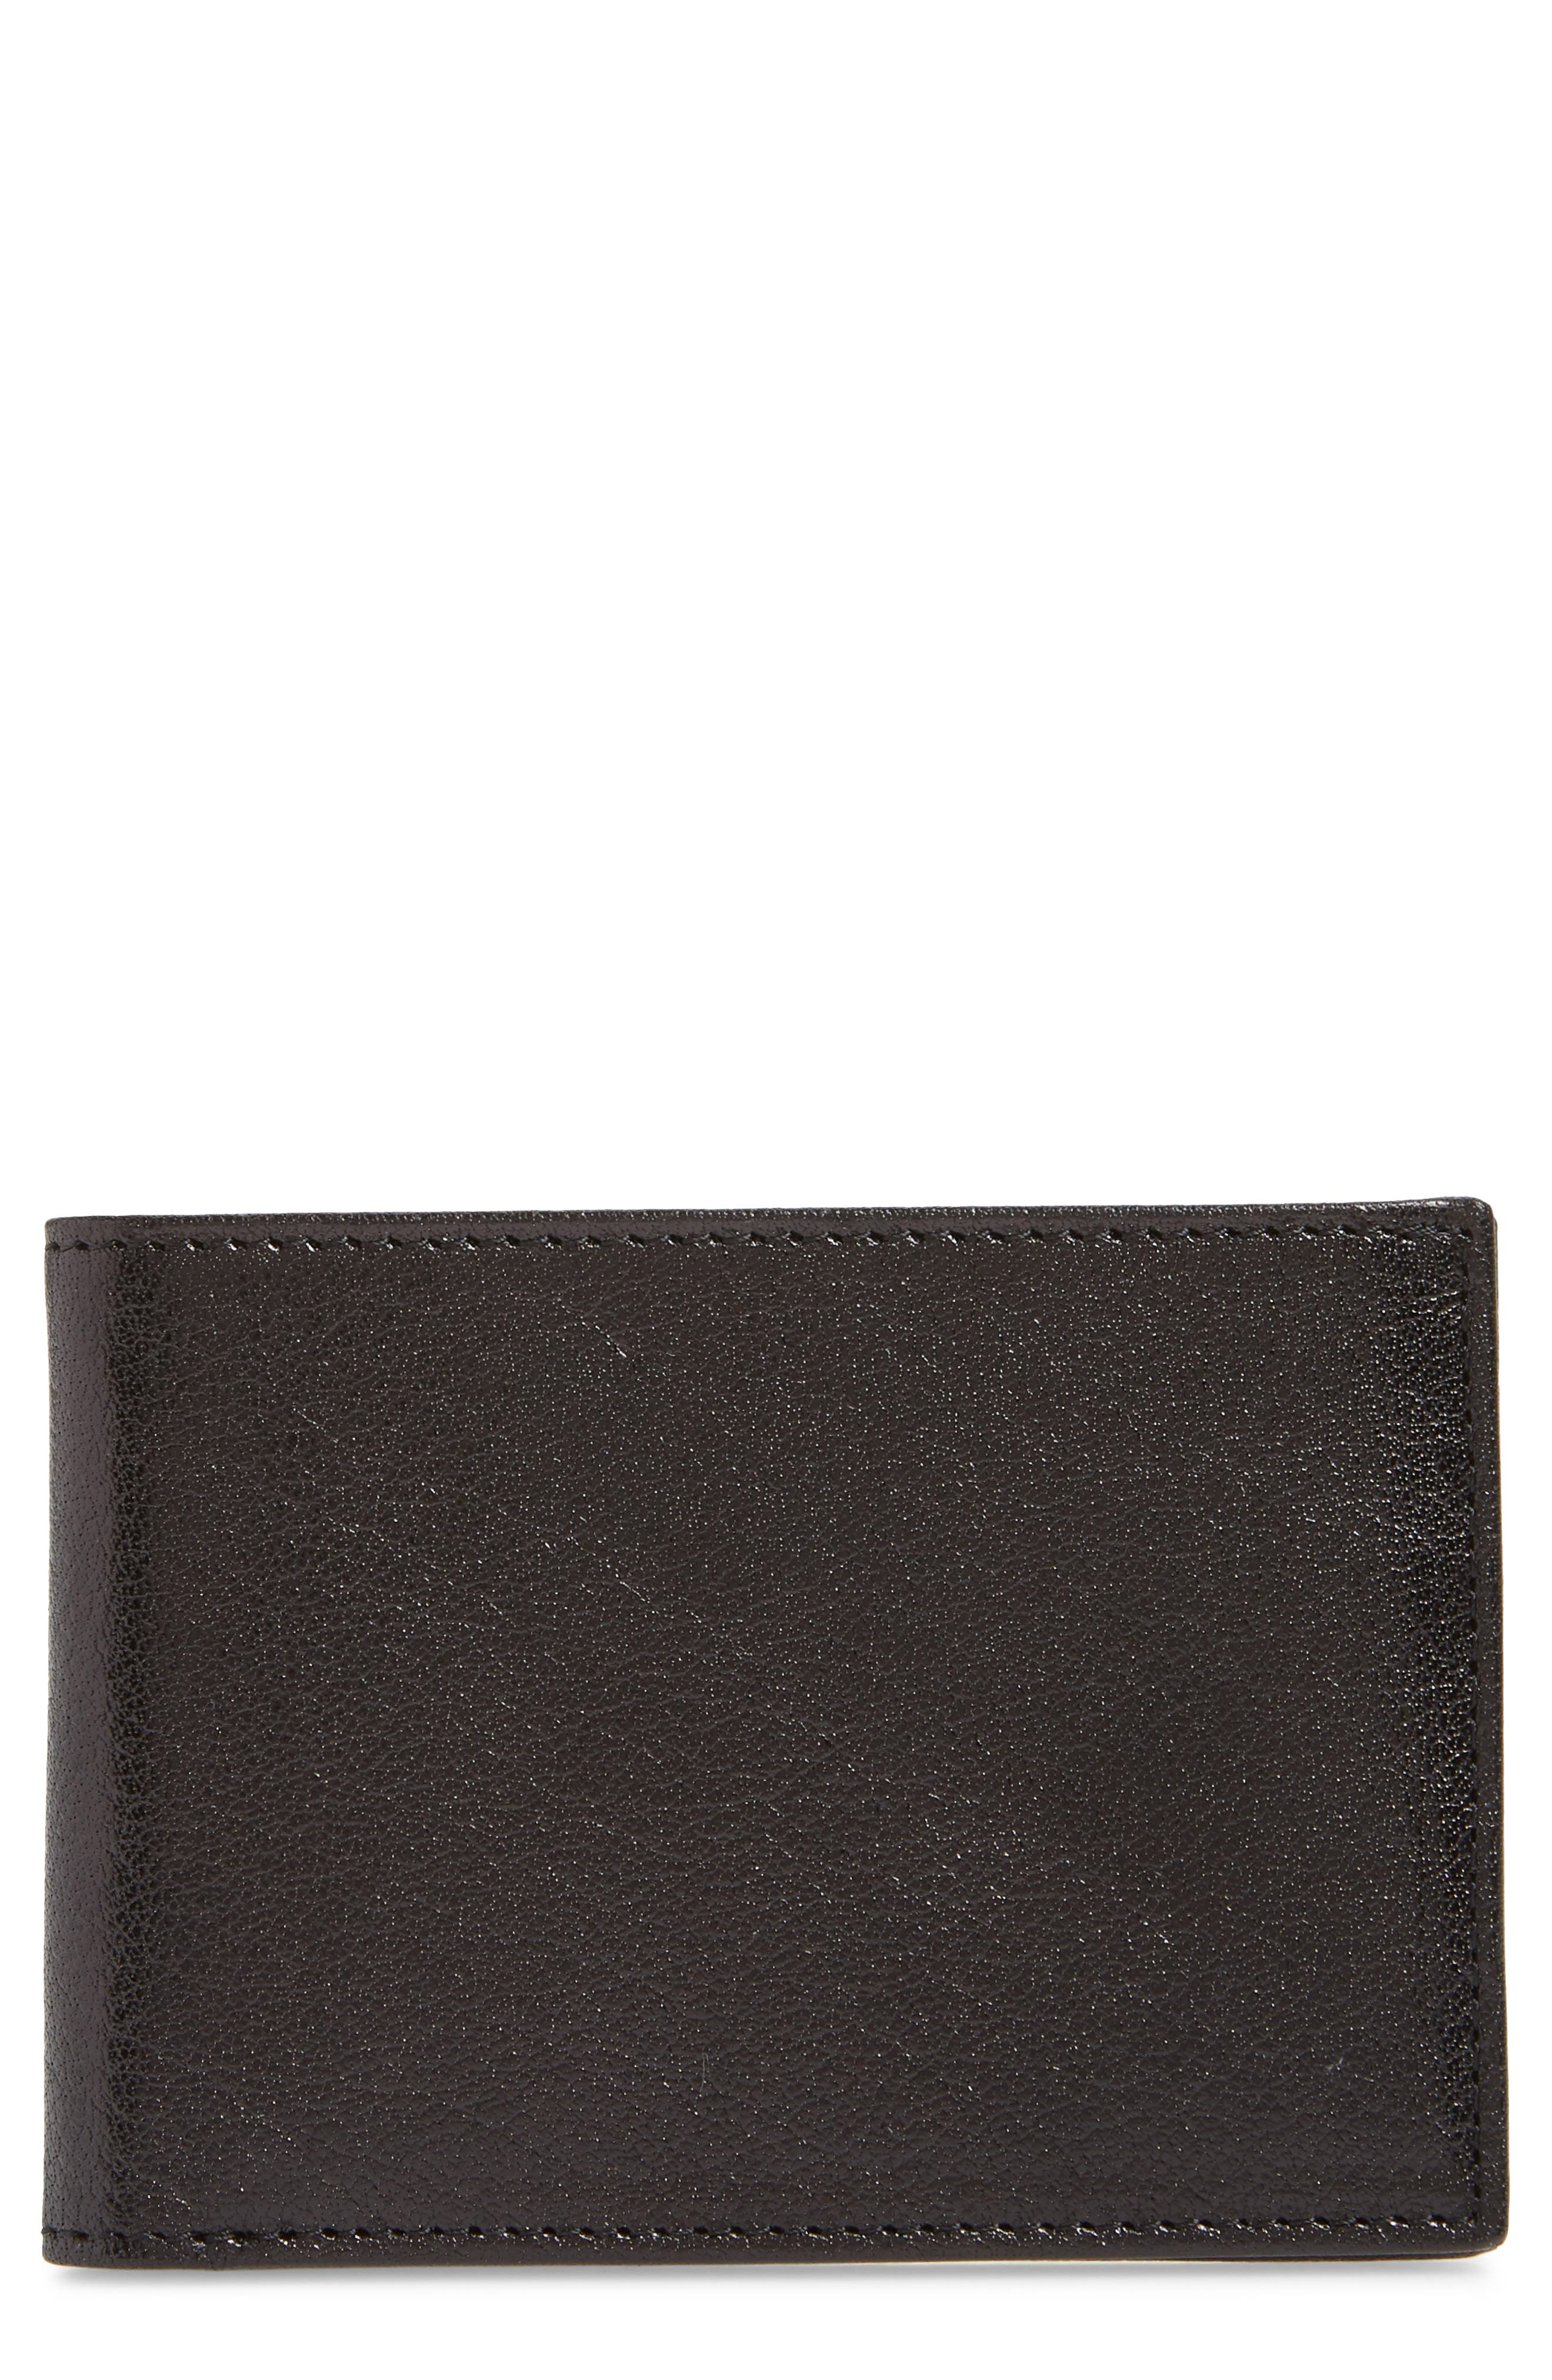 Landon Slim Leather Wallet,                             Main thumbnail 1, color,                             001